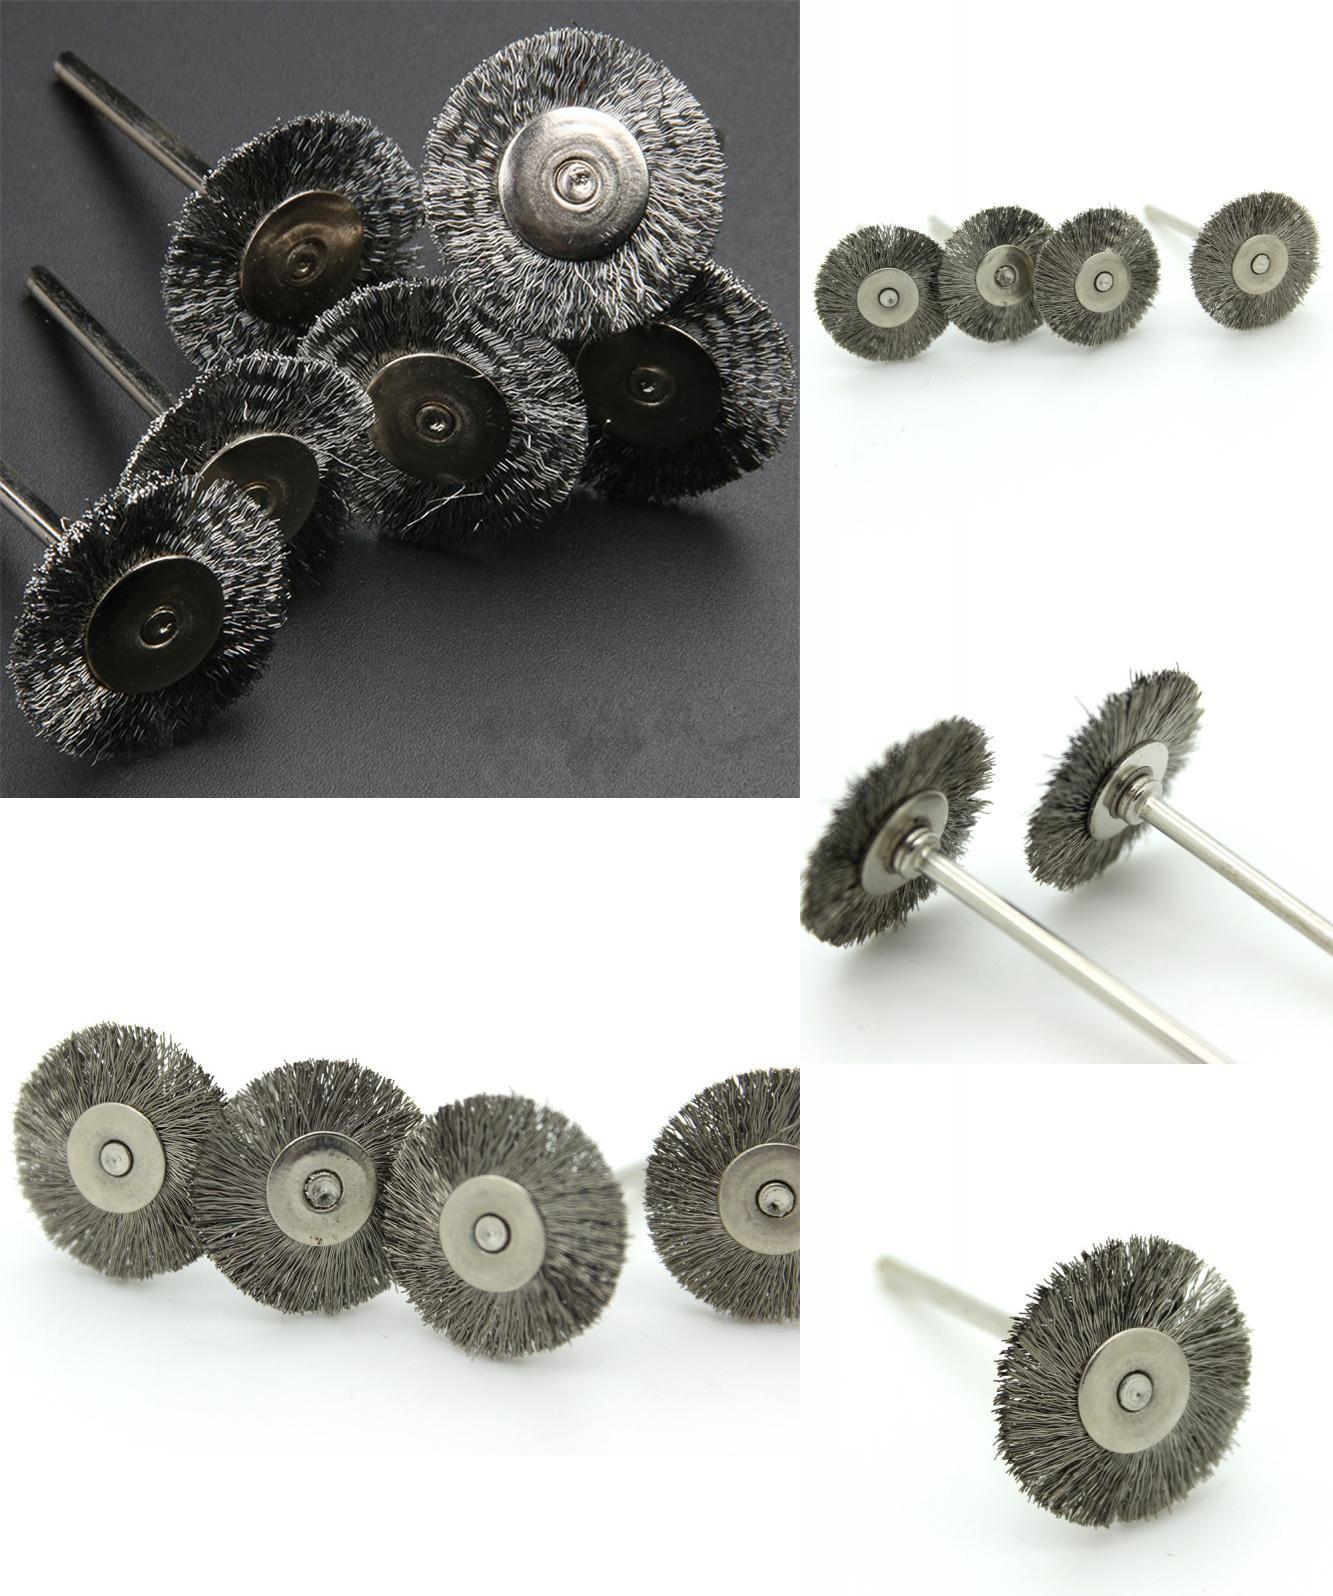 Visit to Buy] 5pcs Dremel Accessories 25mm Polishing Brush Wire ...